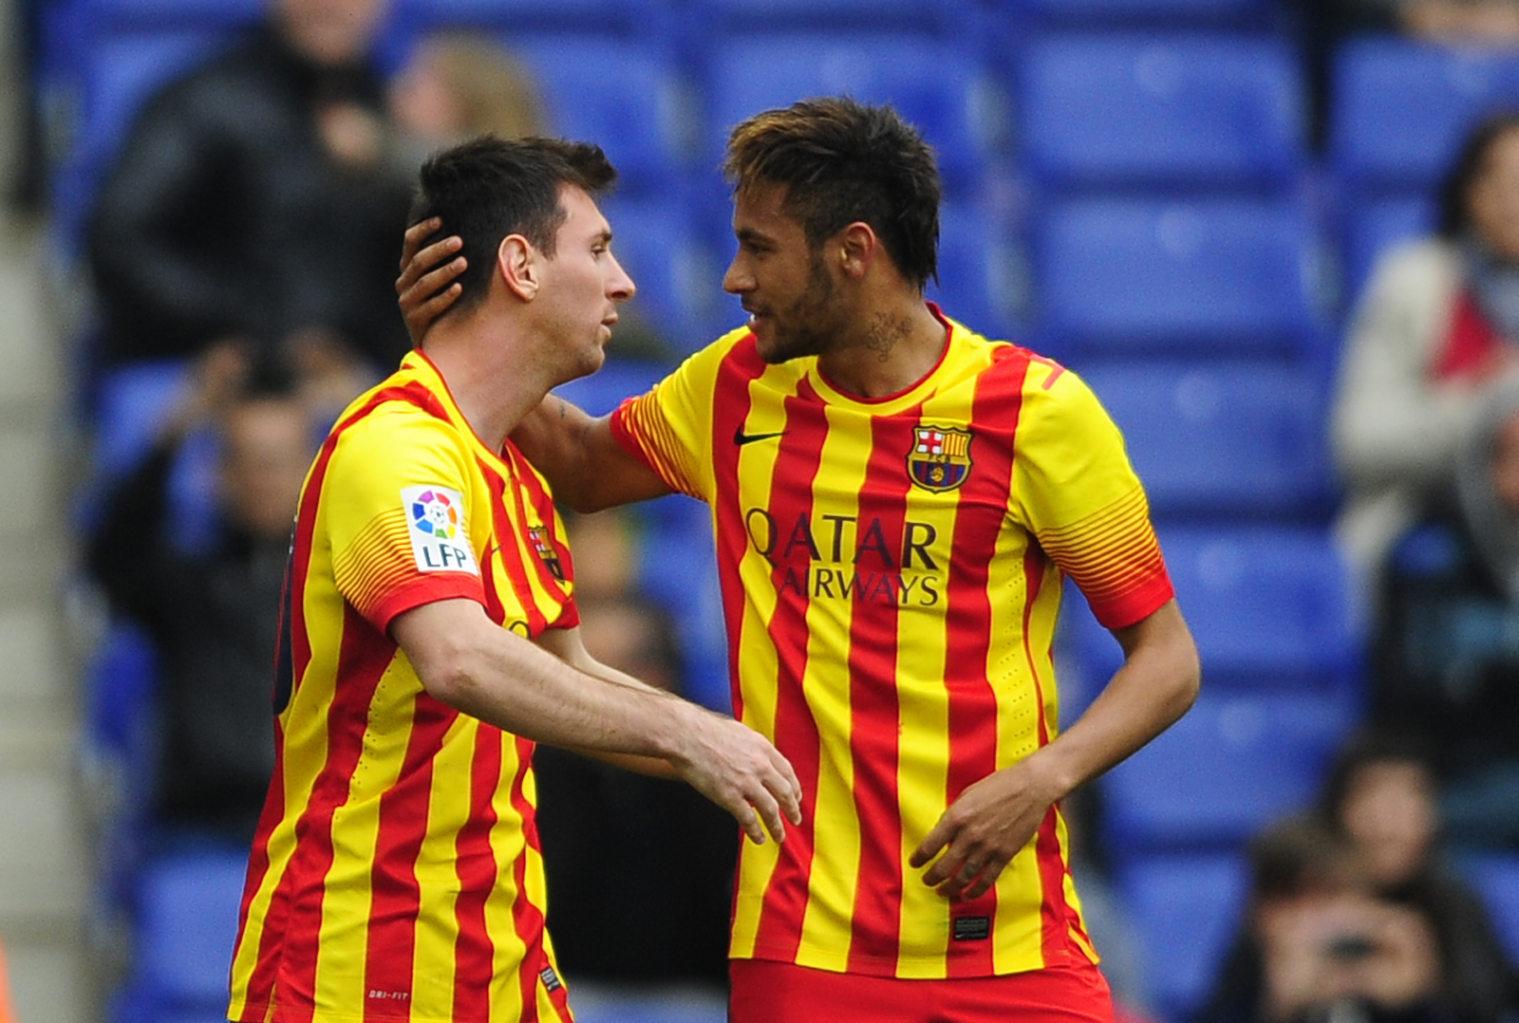 Neymar Messi Barcelona wallpaper HD 1519x1023